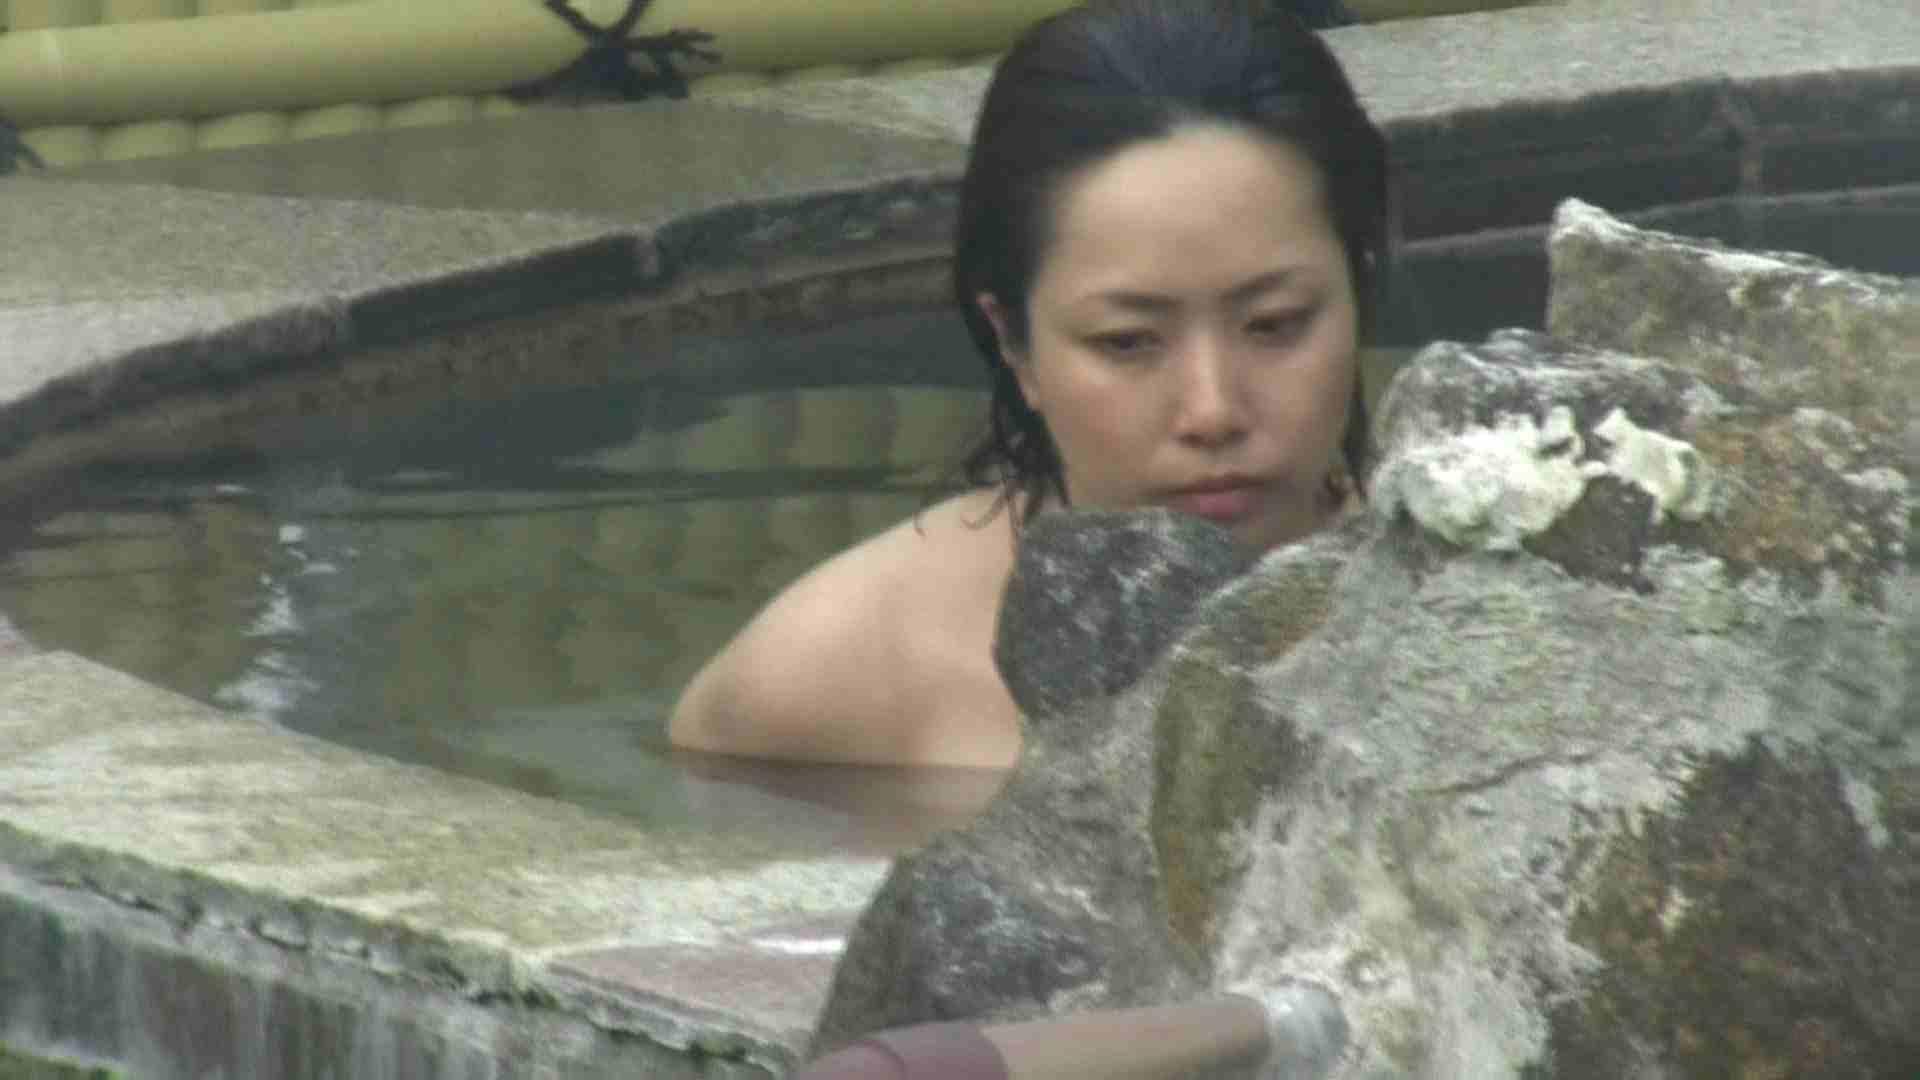 Aquaな露天風呂Vol.604 女体盗撮 盗撮オメコ無修正動画無料 67連発 29